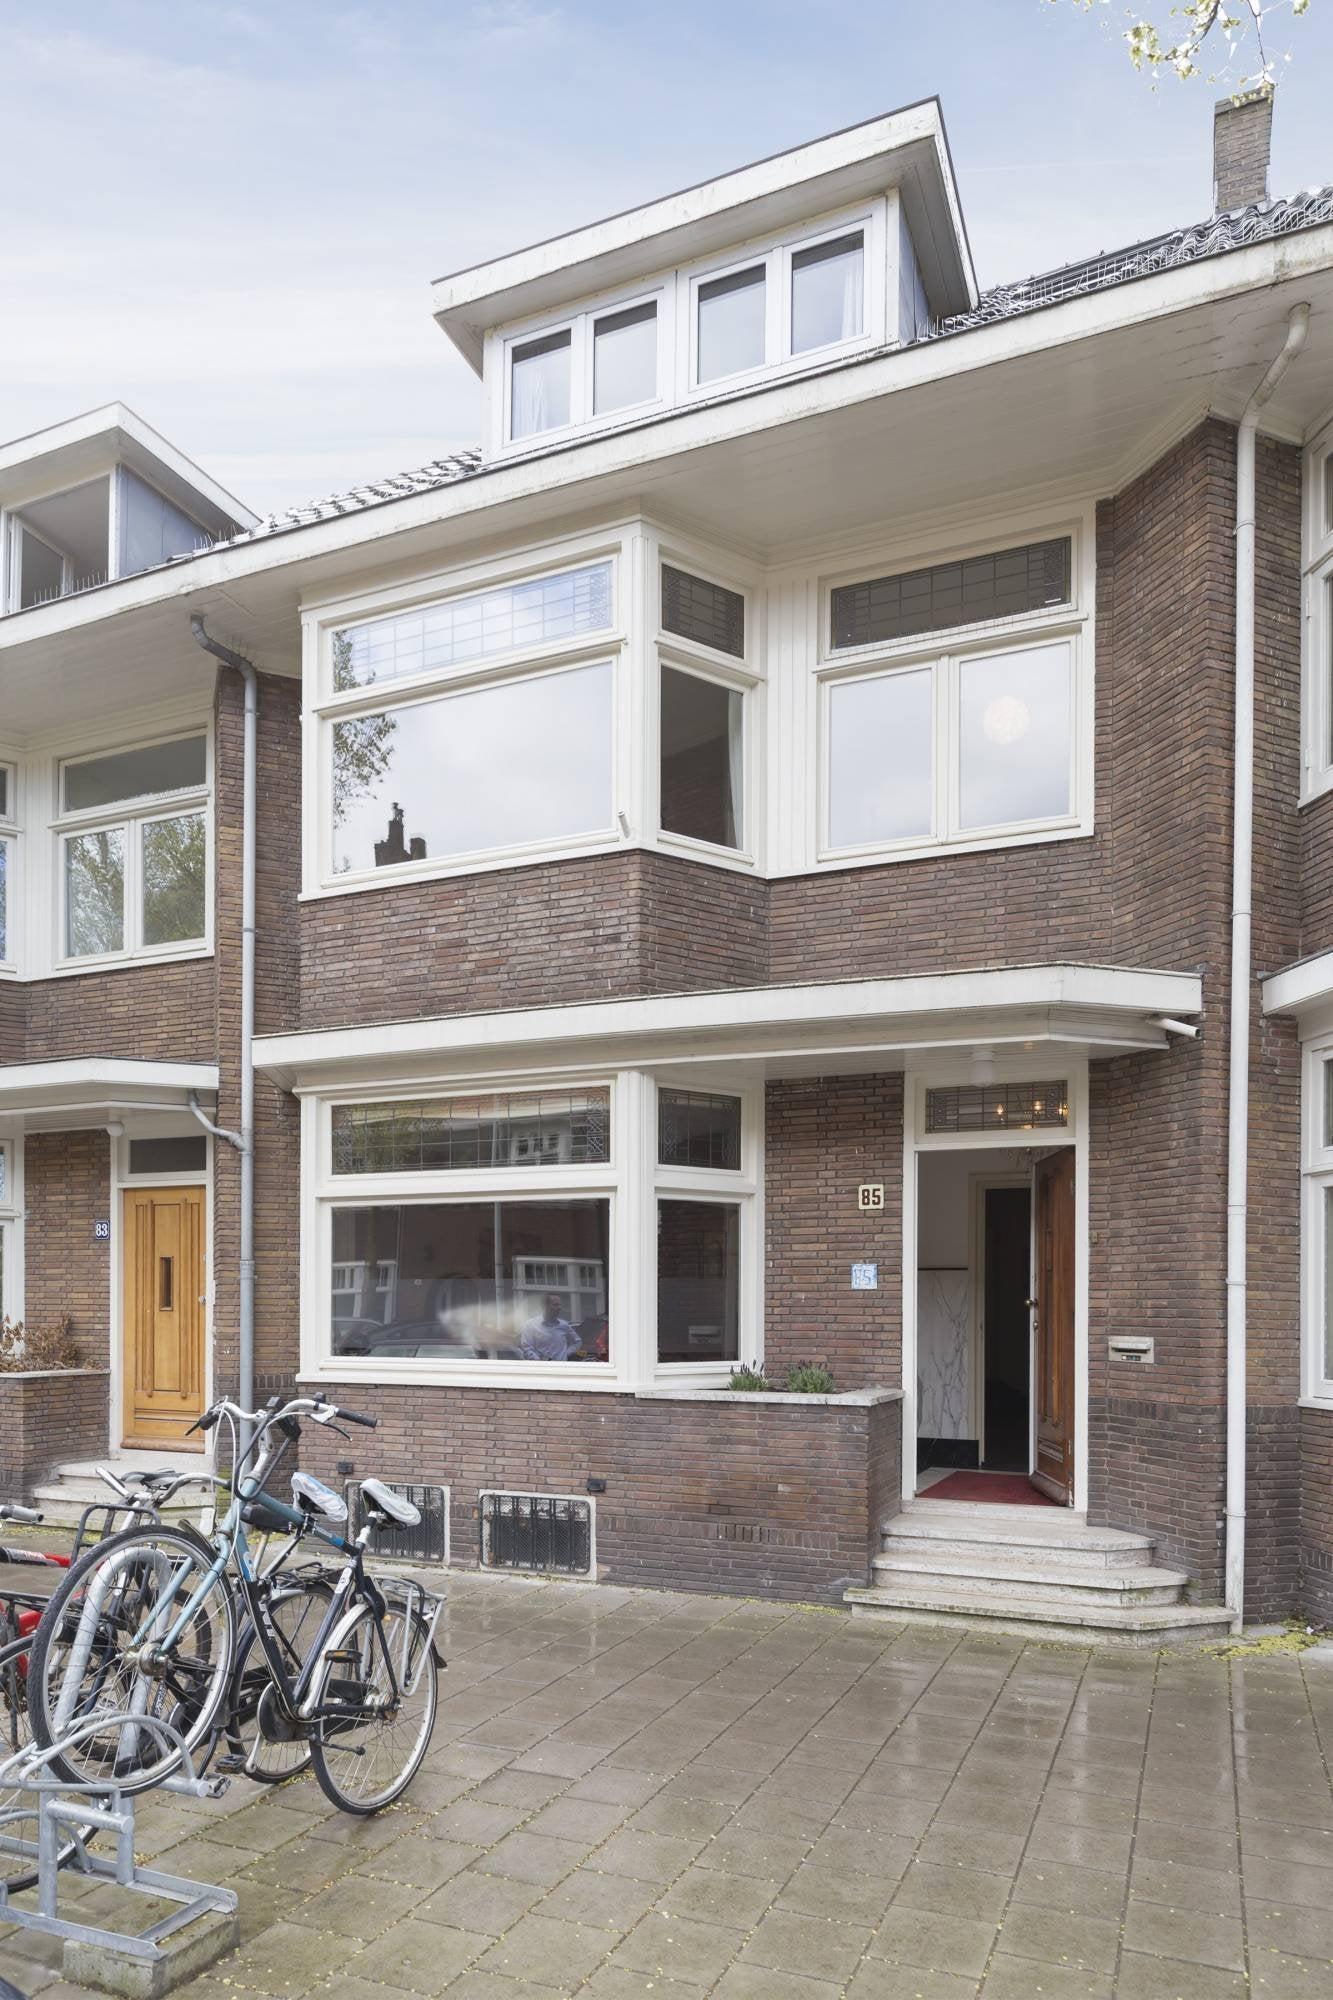 https://public.parariusoffice.nl/15/photos/huge/51221817.1494850011-904.jpg